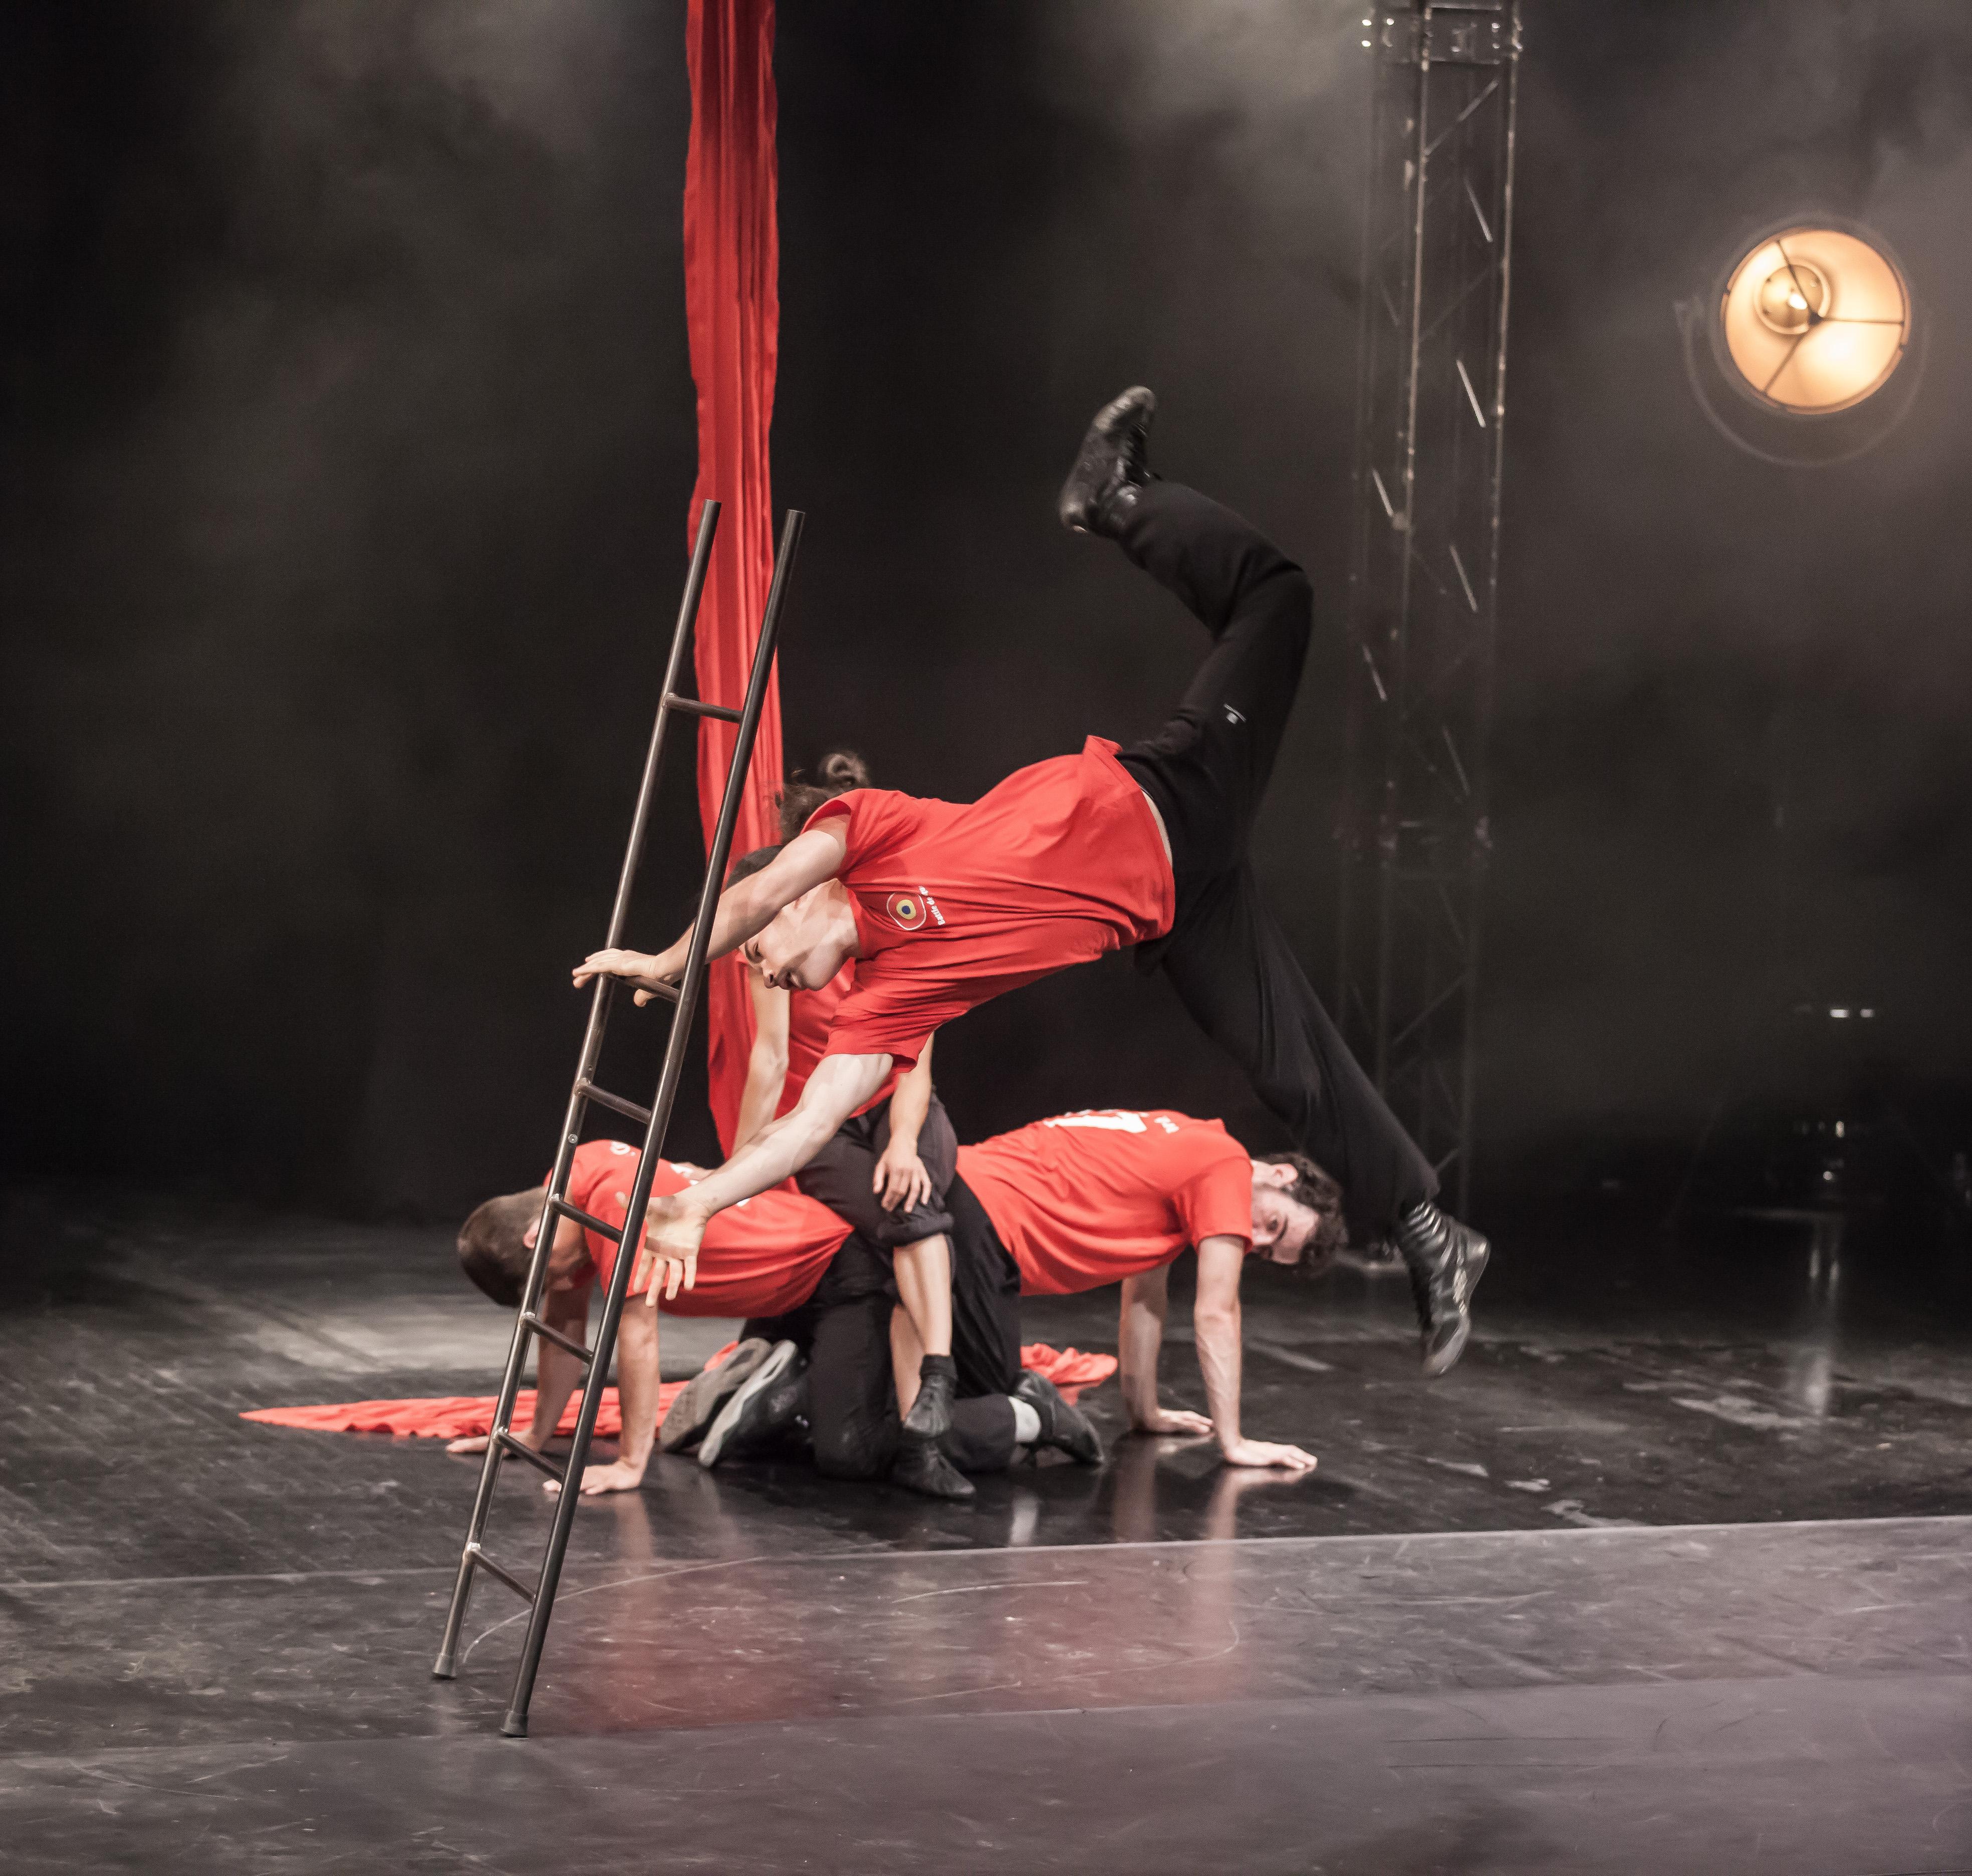 170701-battle-cirque-jdufresne-83_35664725302_o